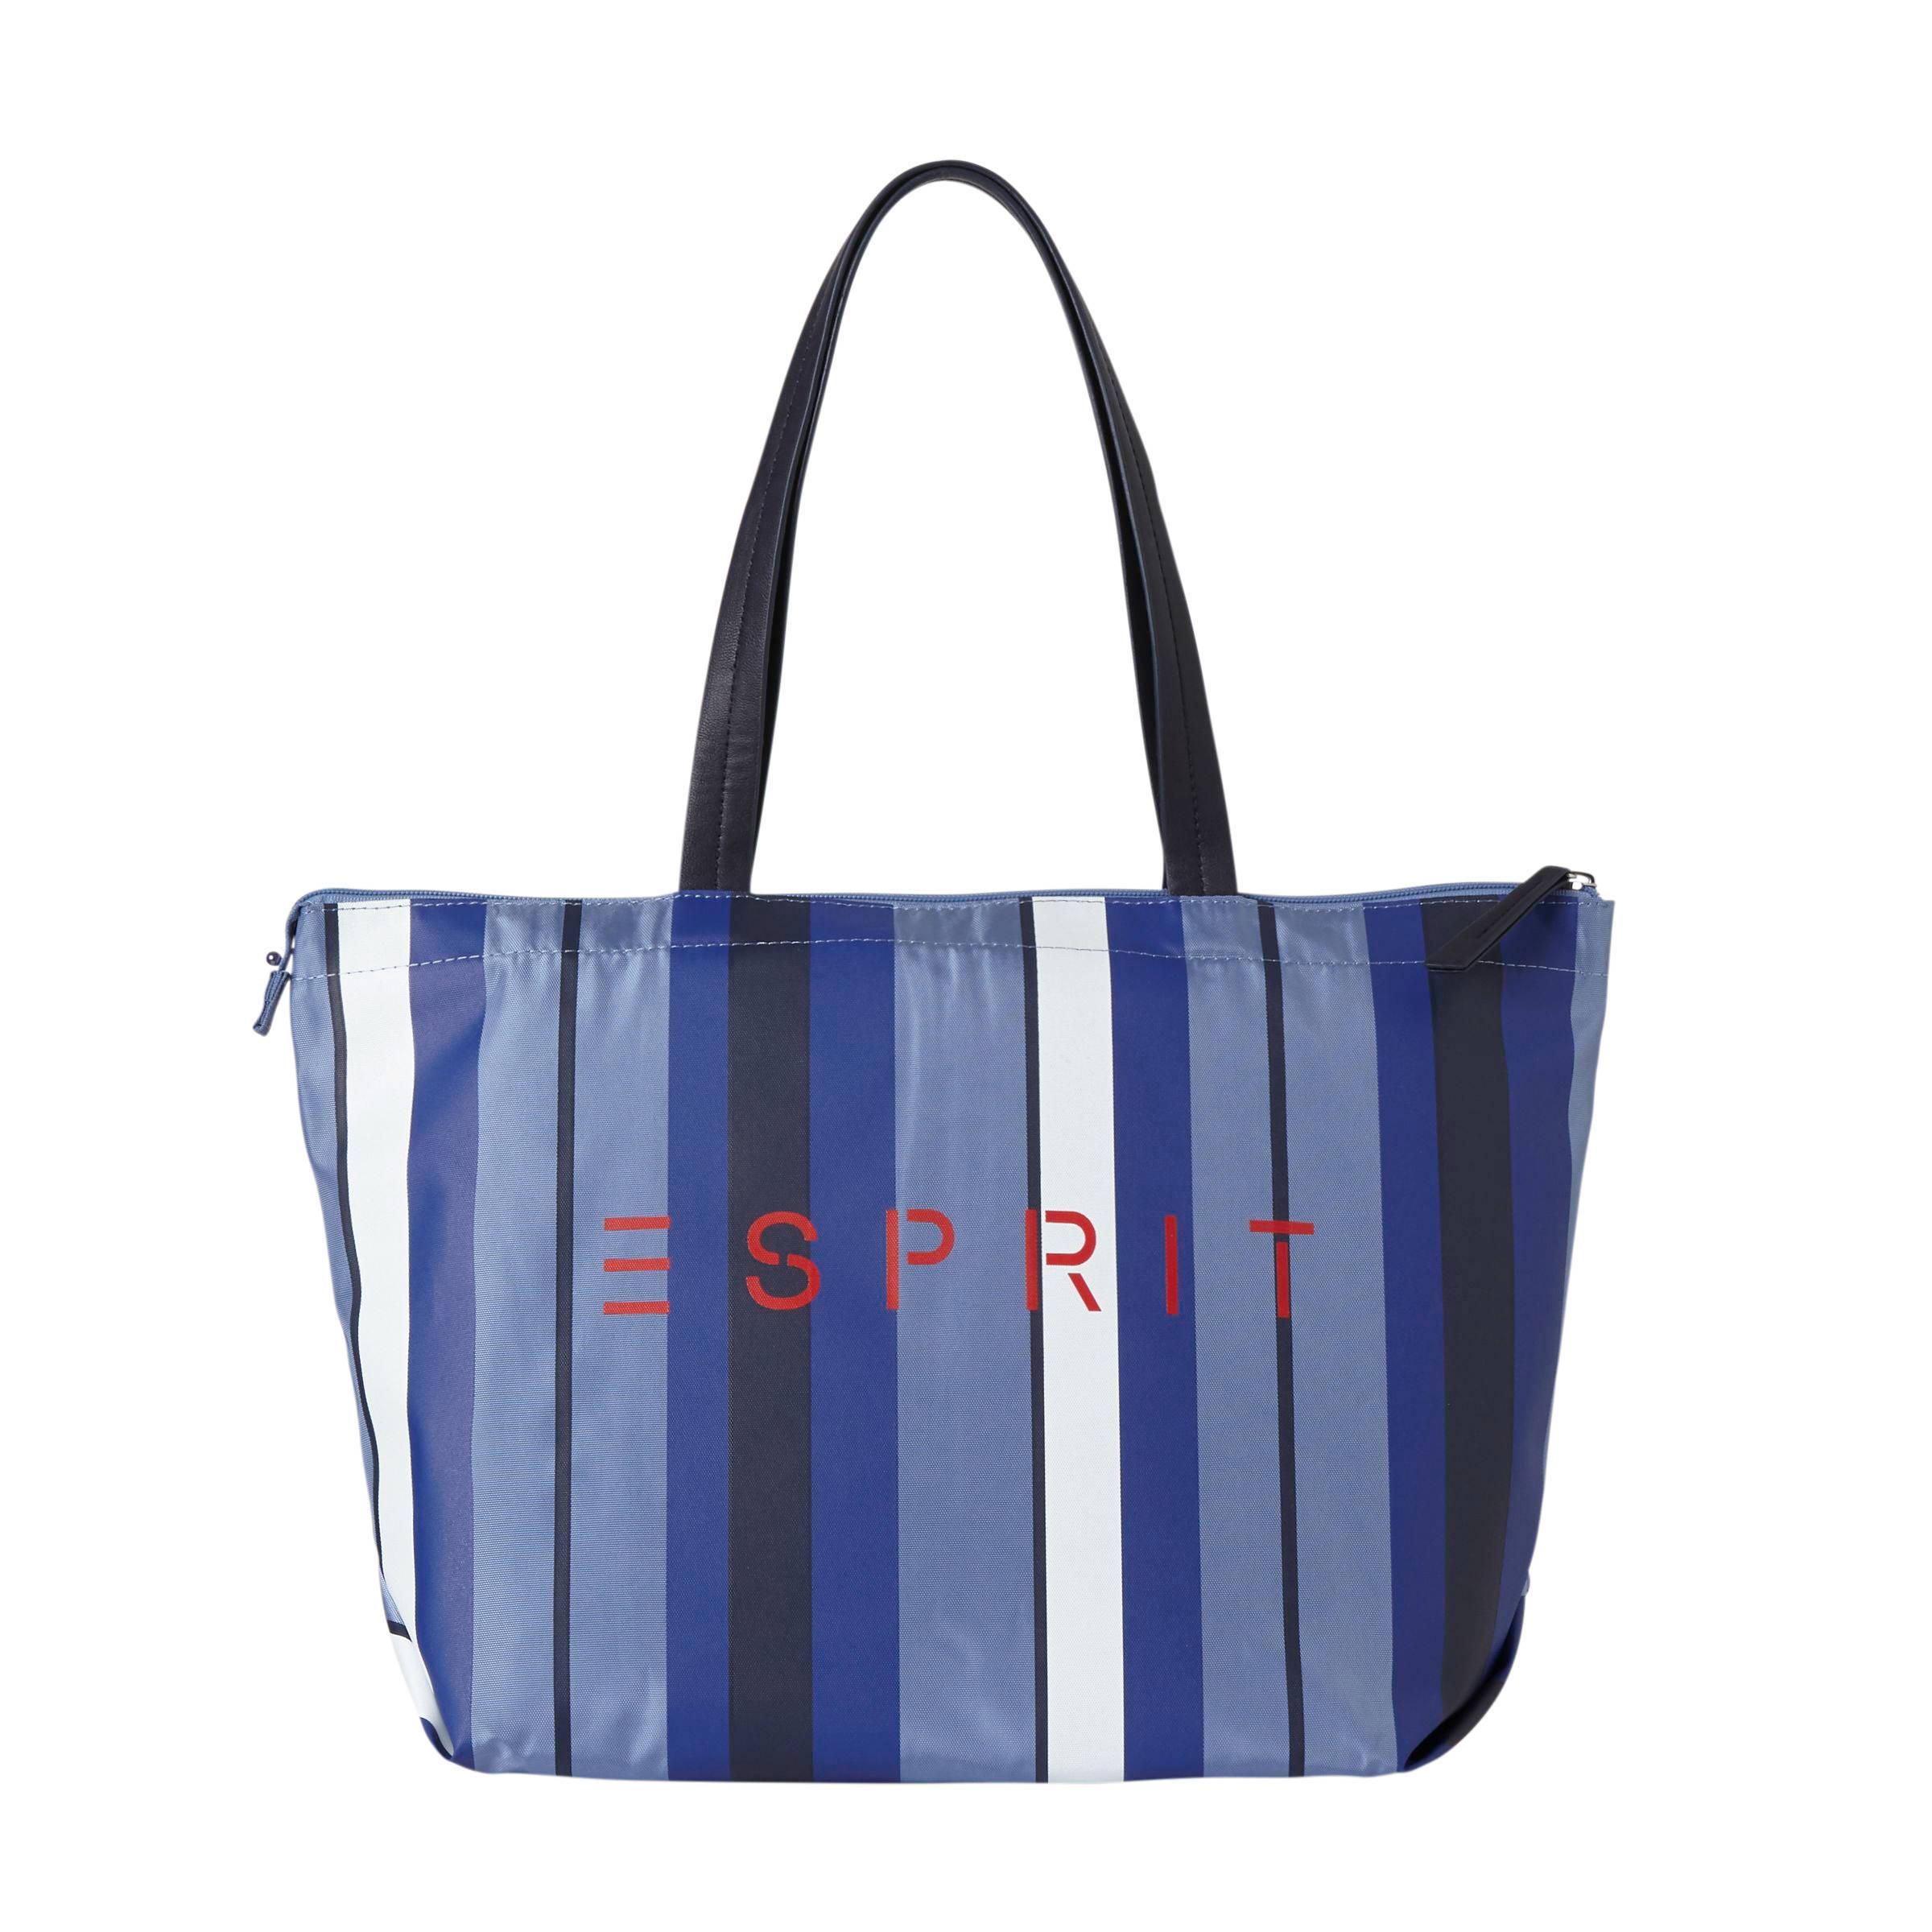 Esprit Wehkamp SaleTassenamp; Dames Gratis Reisbagage Bij l3FTKJ1c